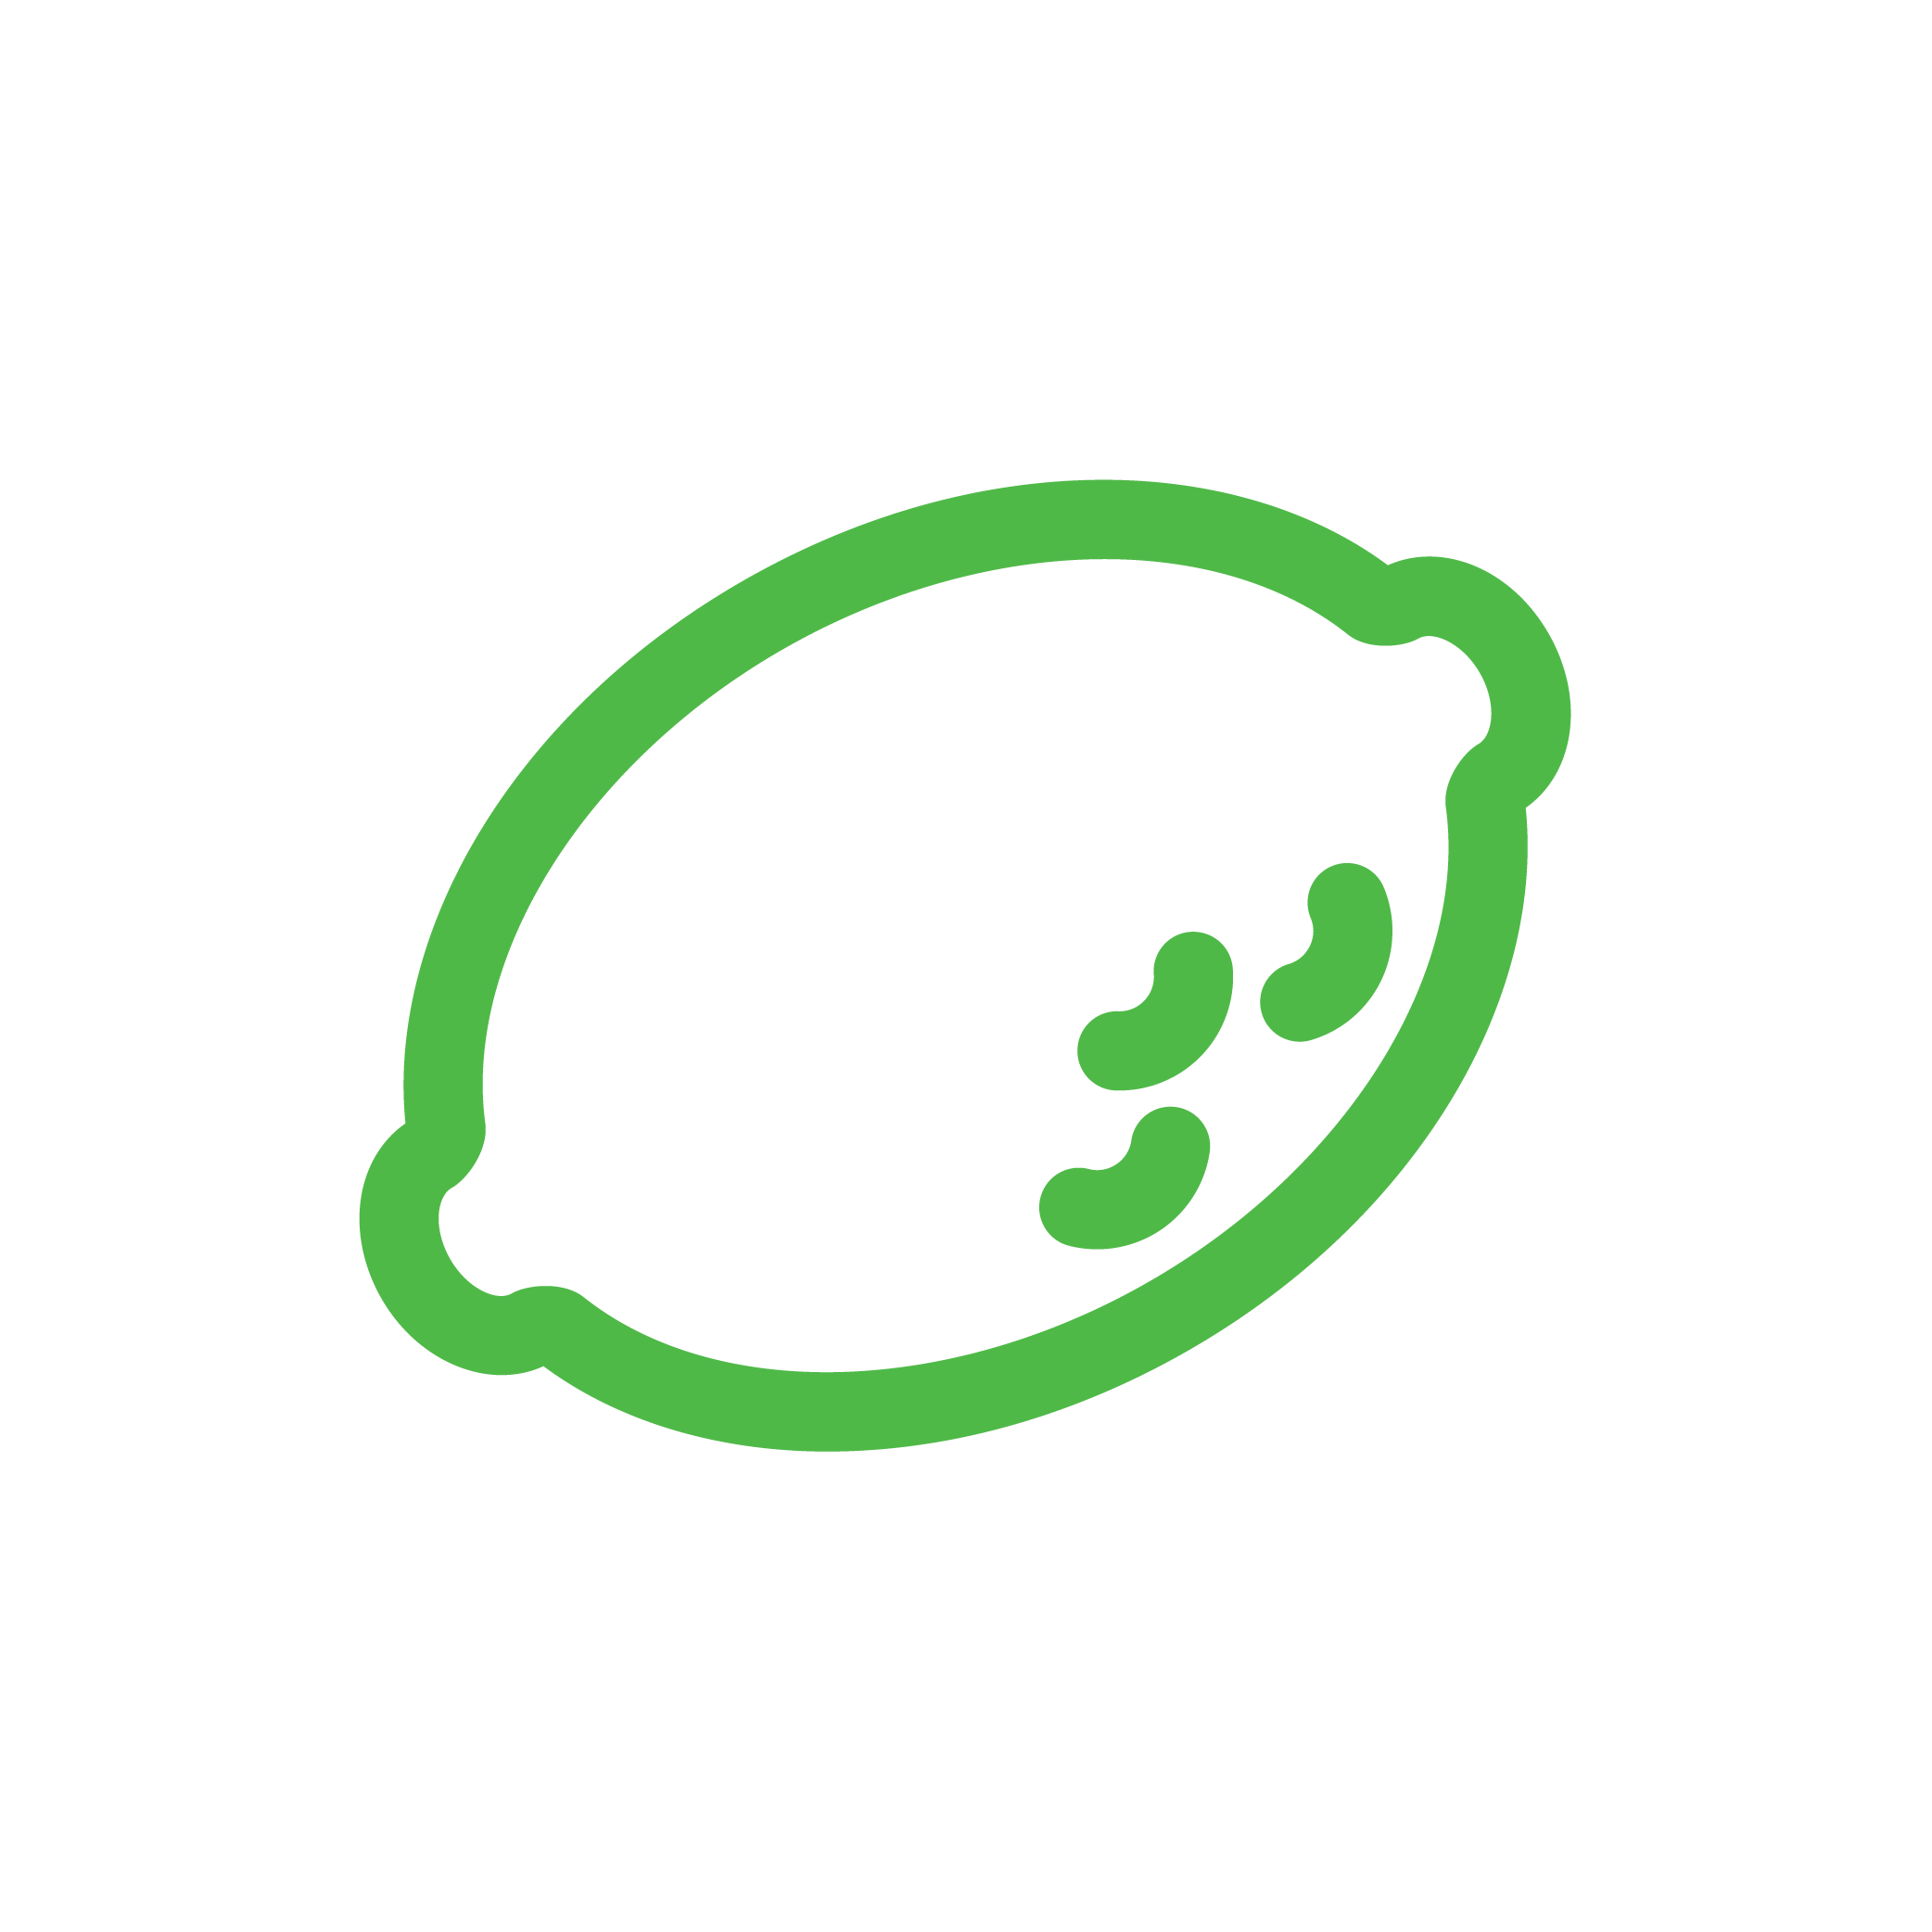 [lemon] -